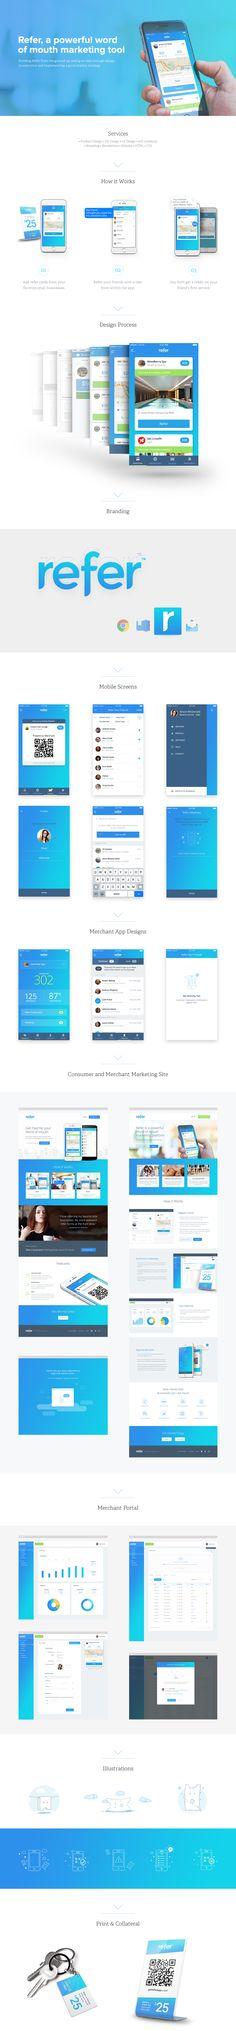 Refer: Product, App & Marketing Design - Case Study